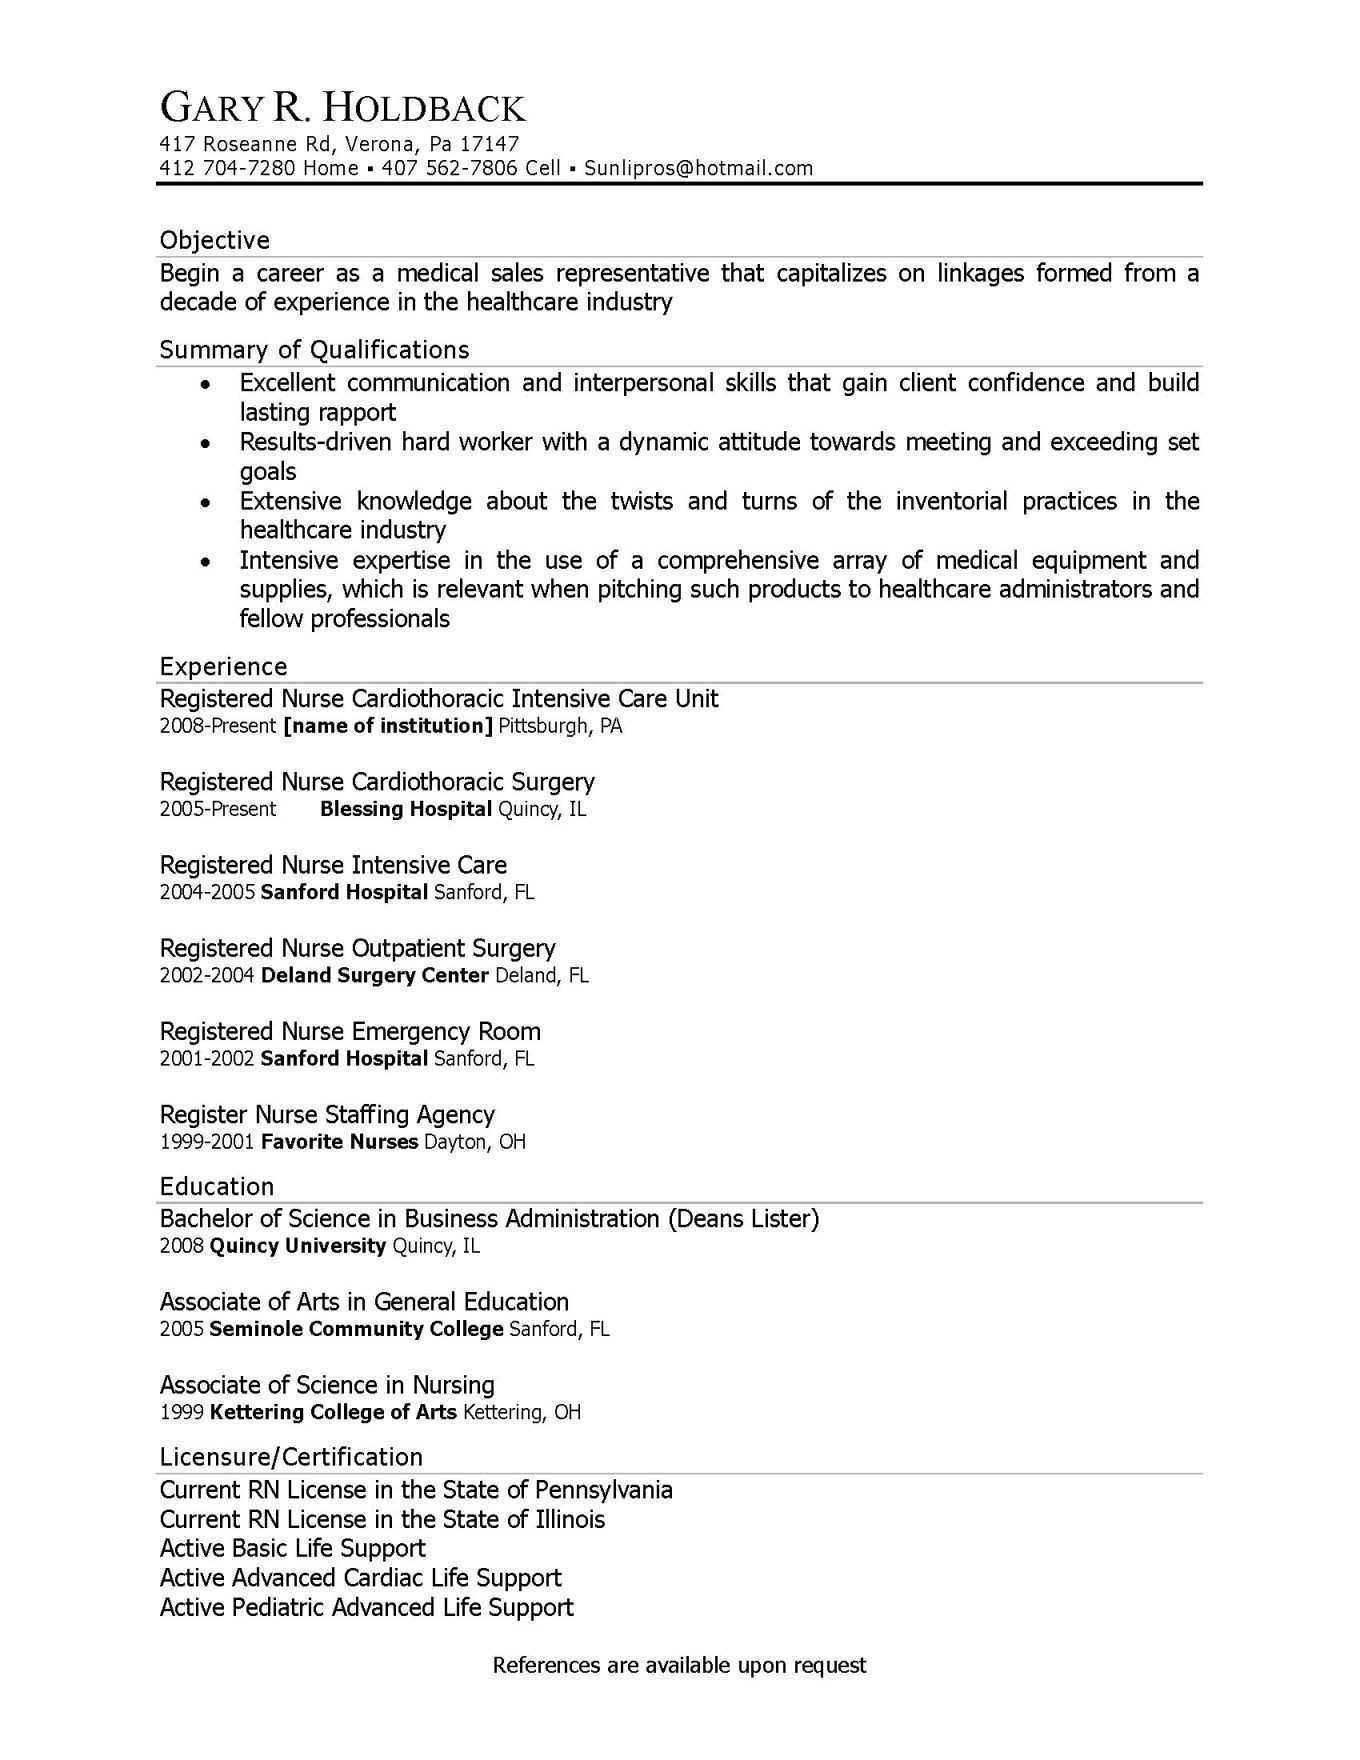 Resume Objective Statement Career Change